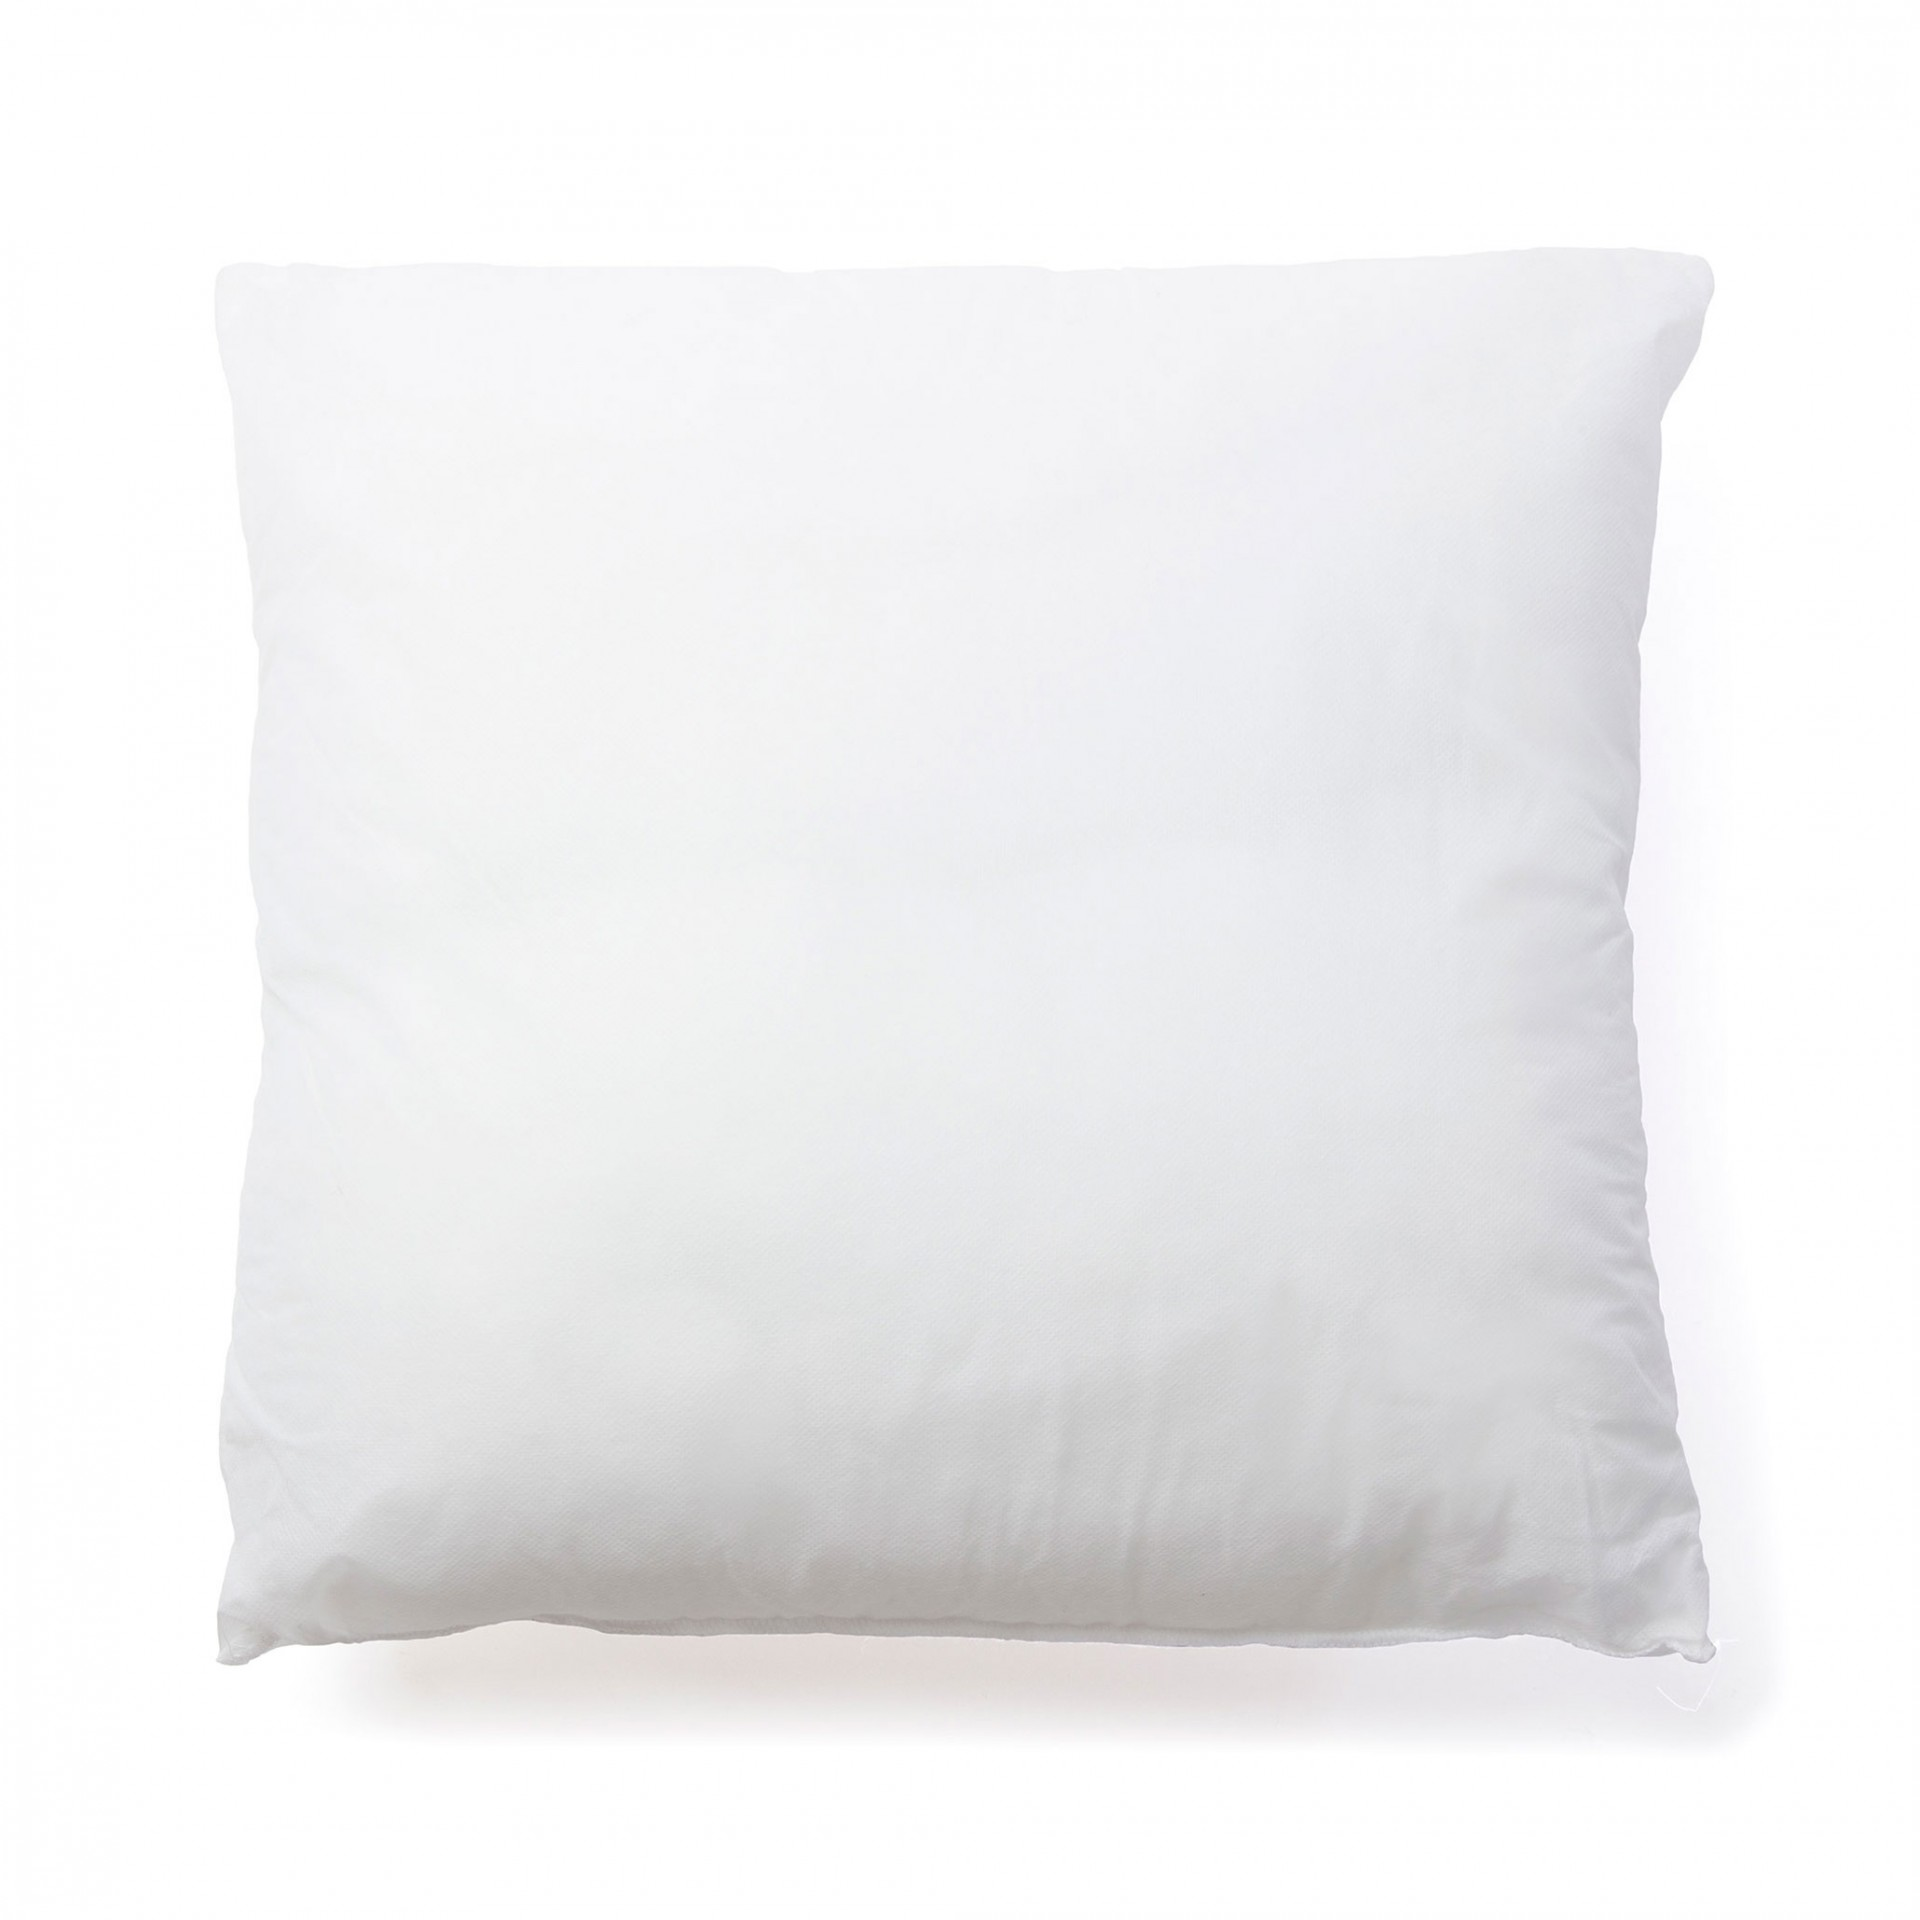 Enchimento p/almofada, 45x45